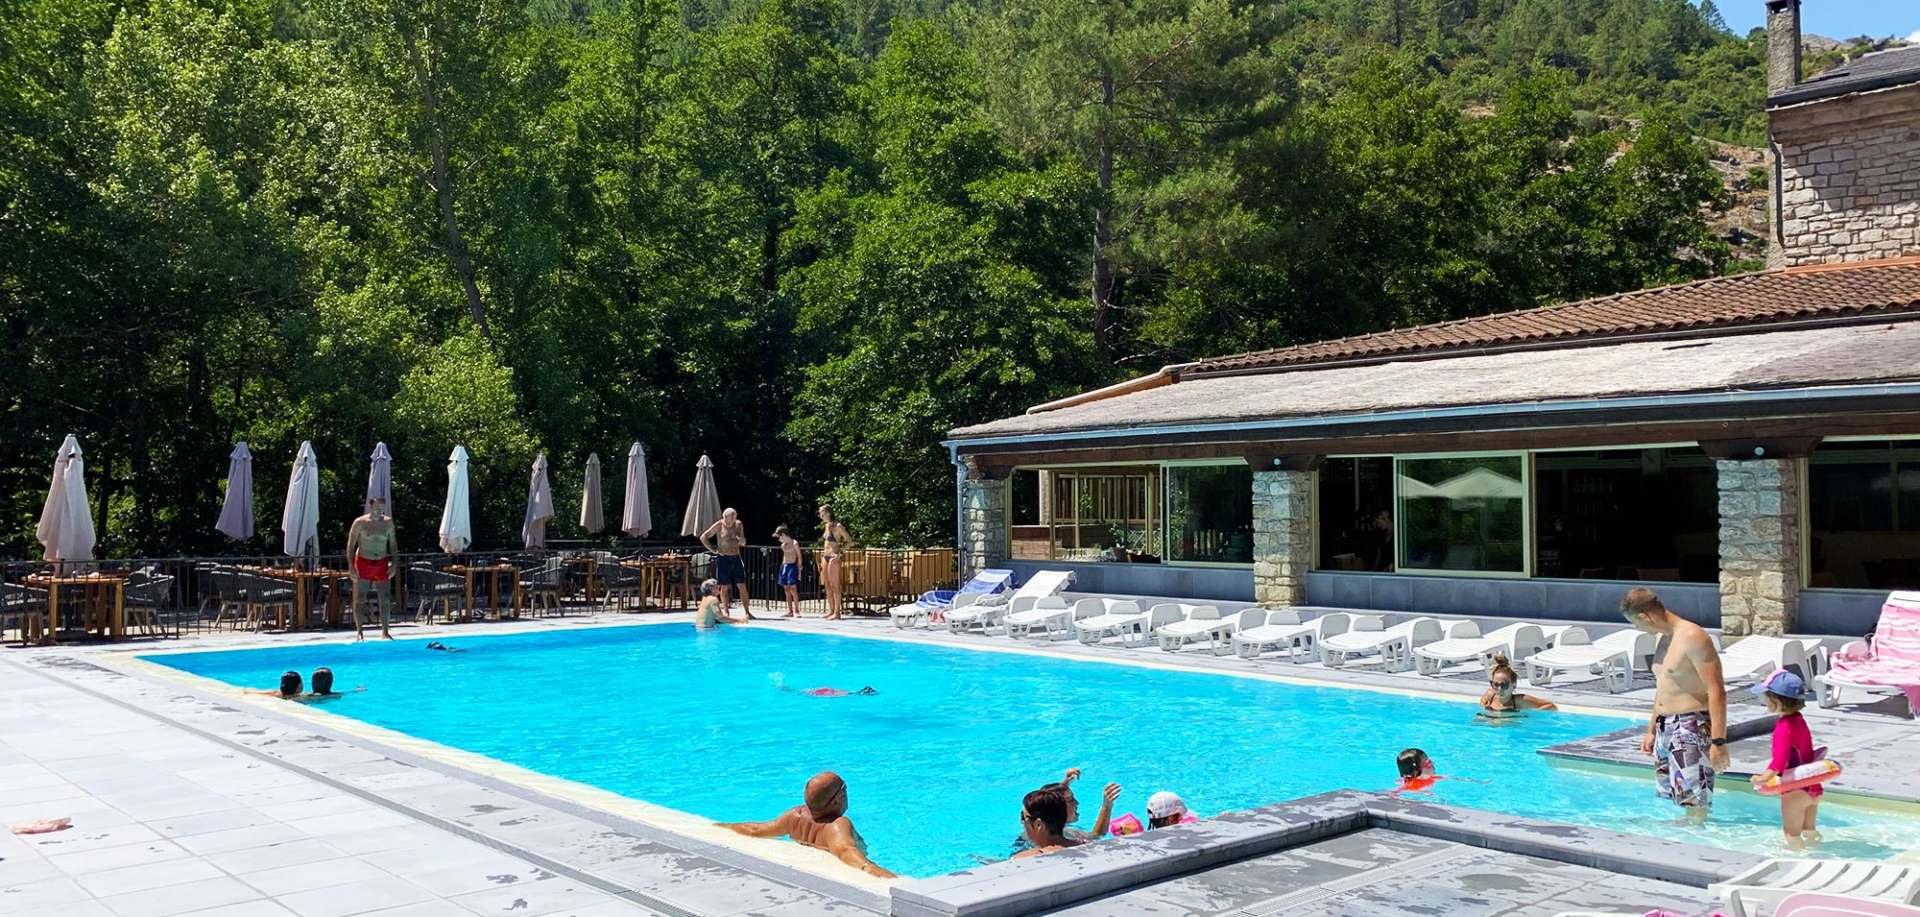 tout servi au bord de la piscine de l'Auberge à Corte | Auberge de la Restonica